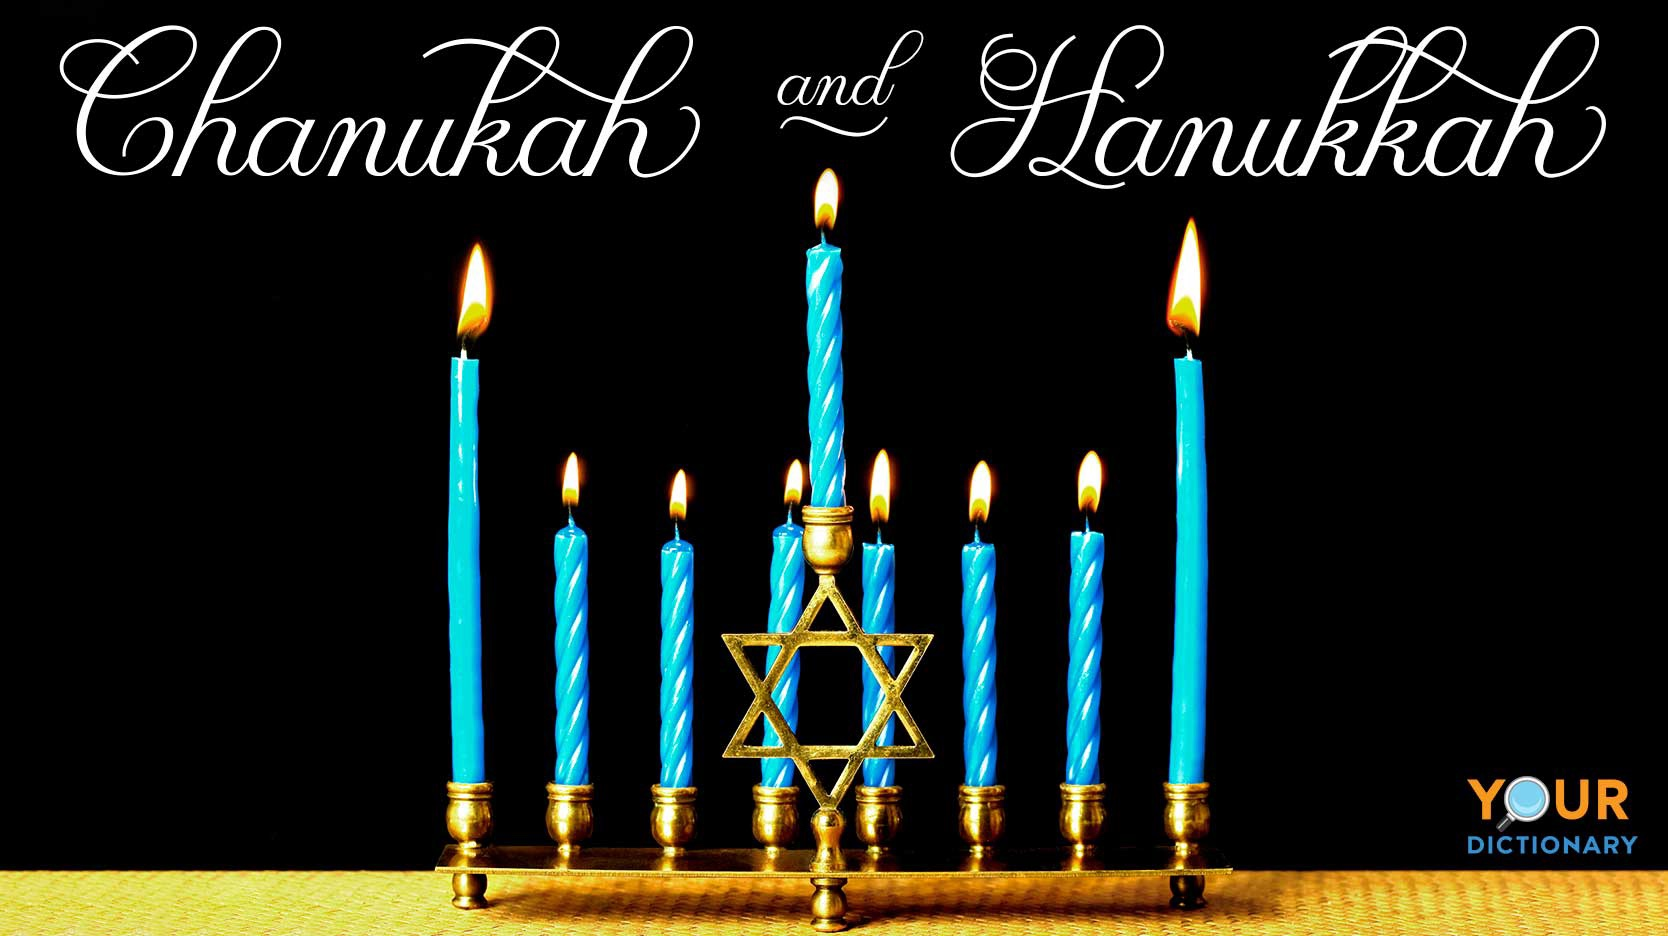 spelling for chanukah and hanukkah